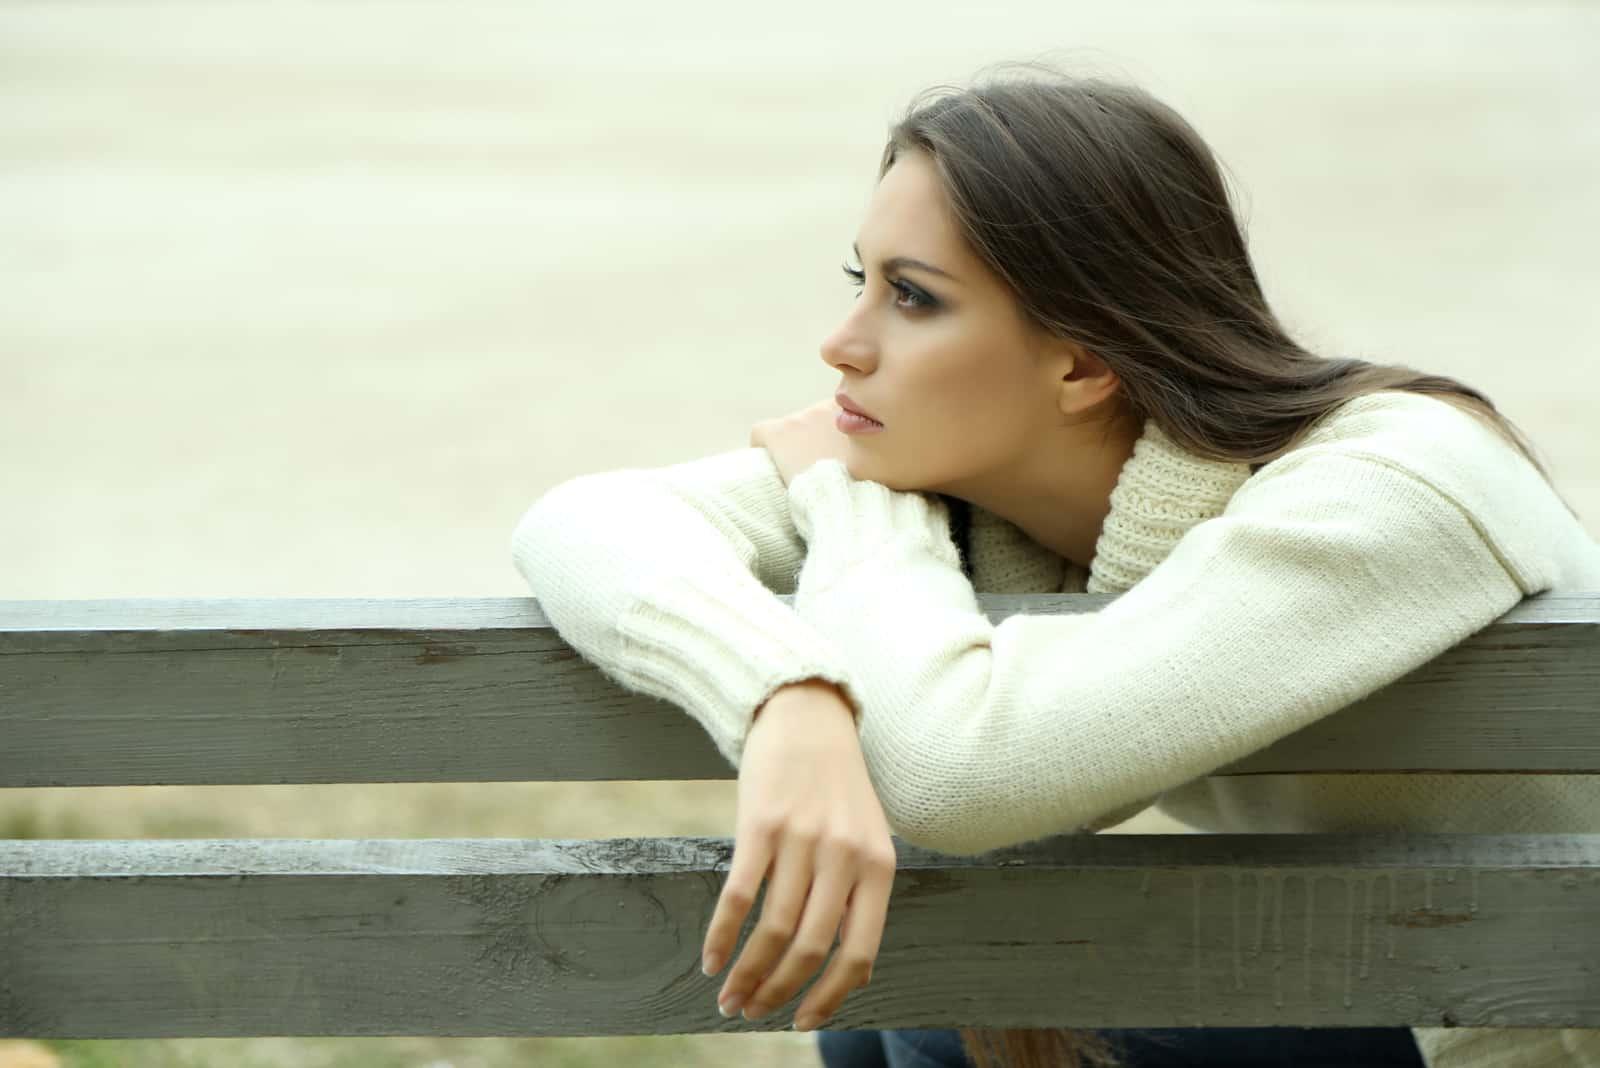 einsame Frau auf Bank im Park